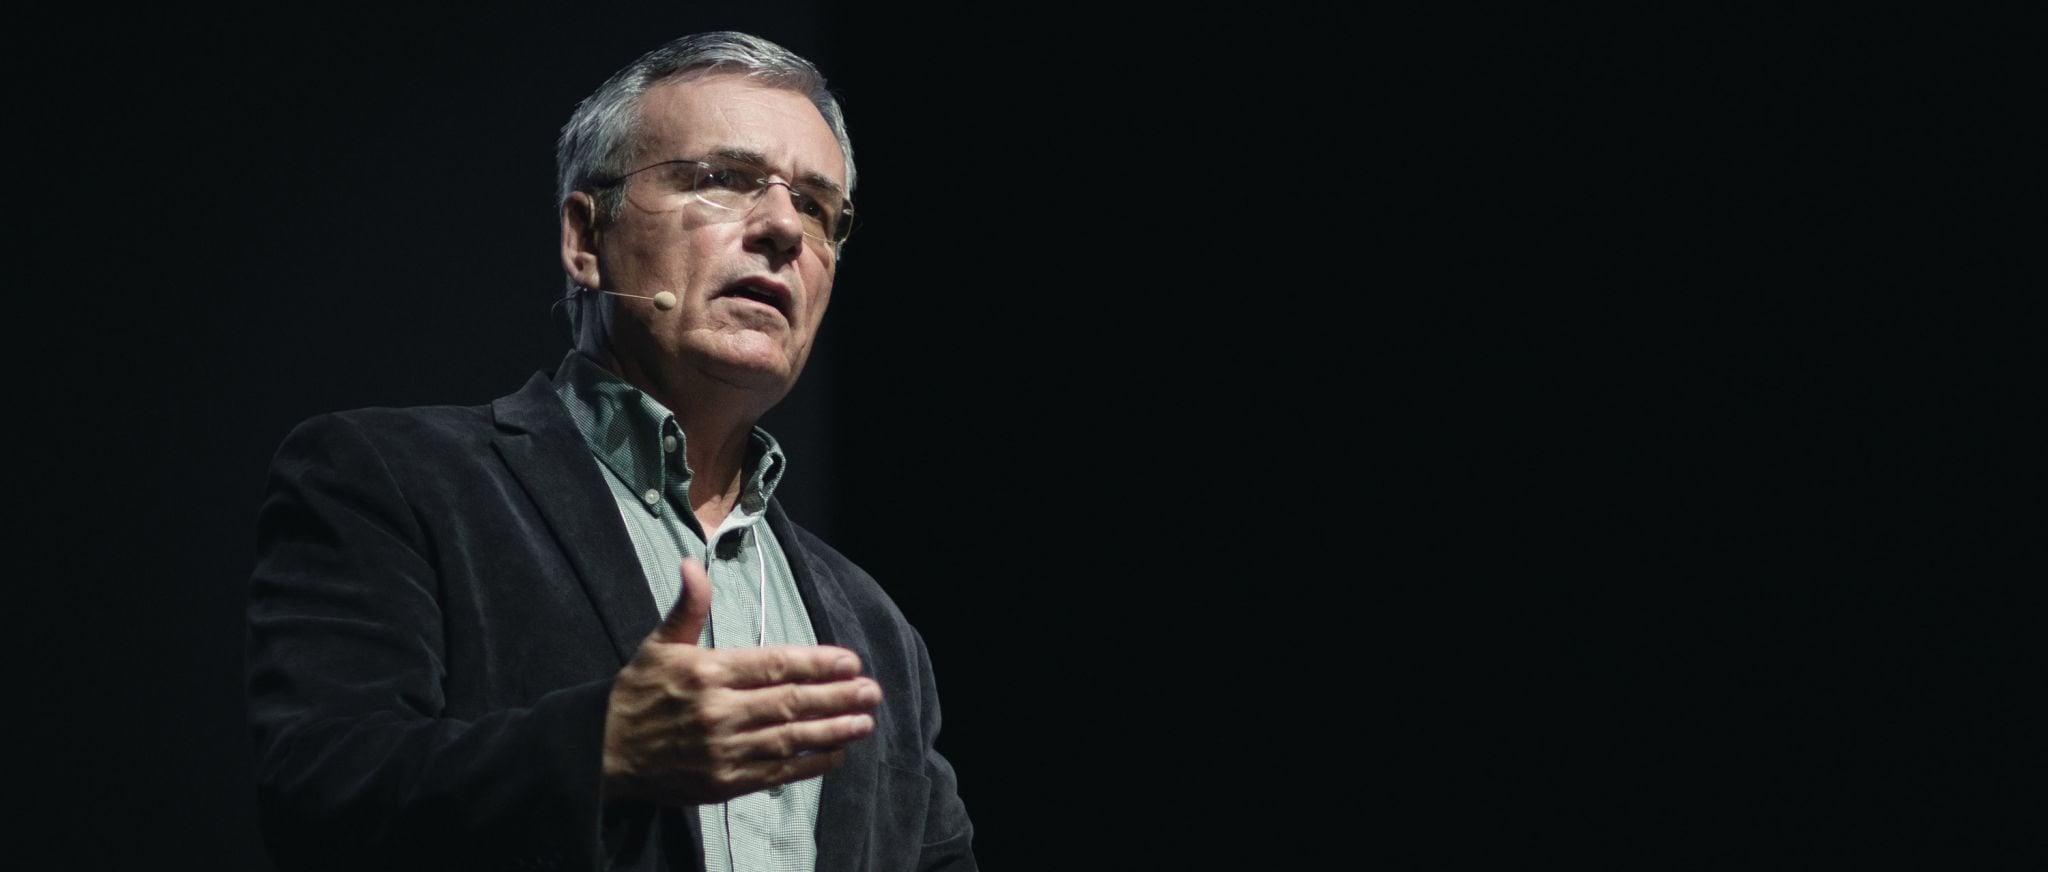 Dr. John Neufeld | Bible teacher at Back to the Bible Canada